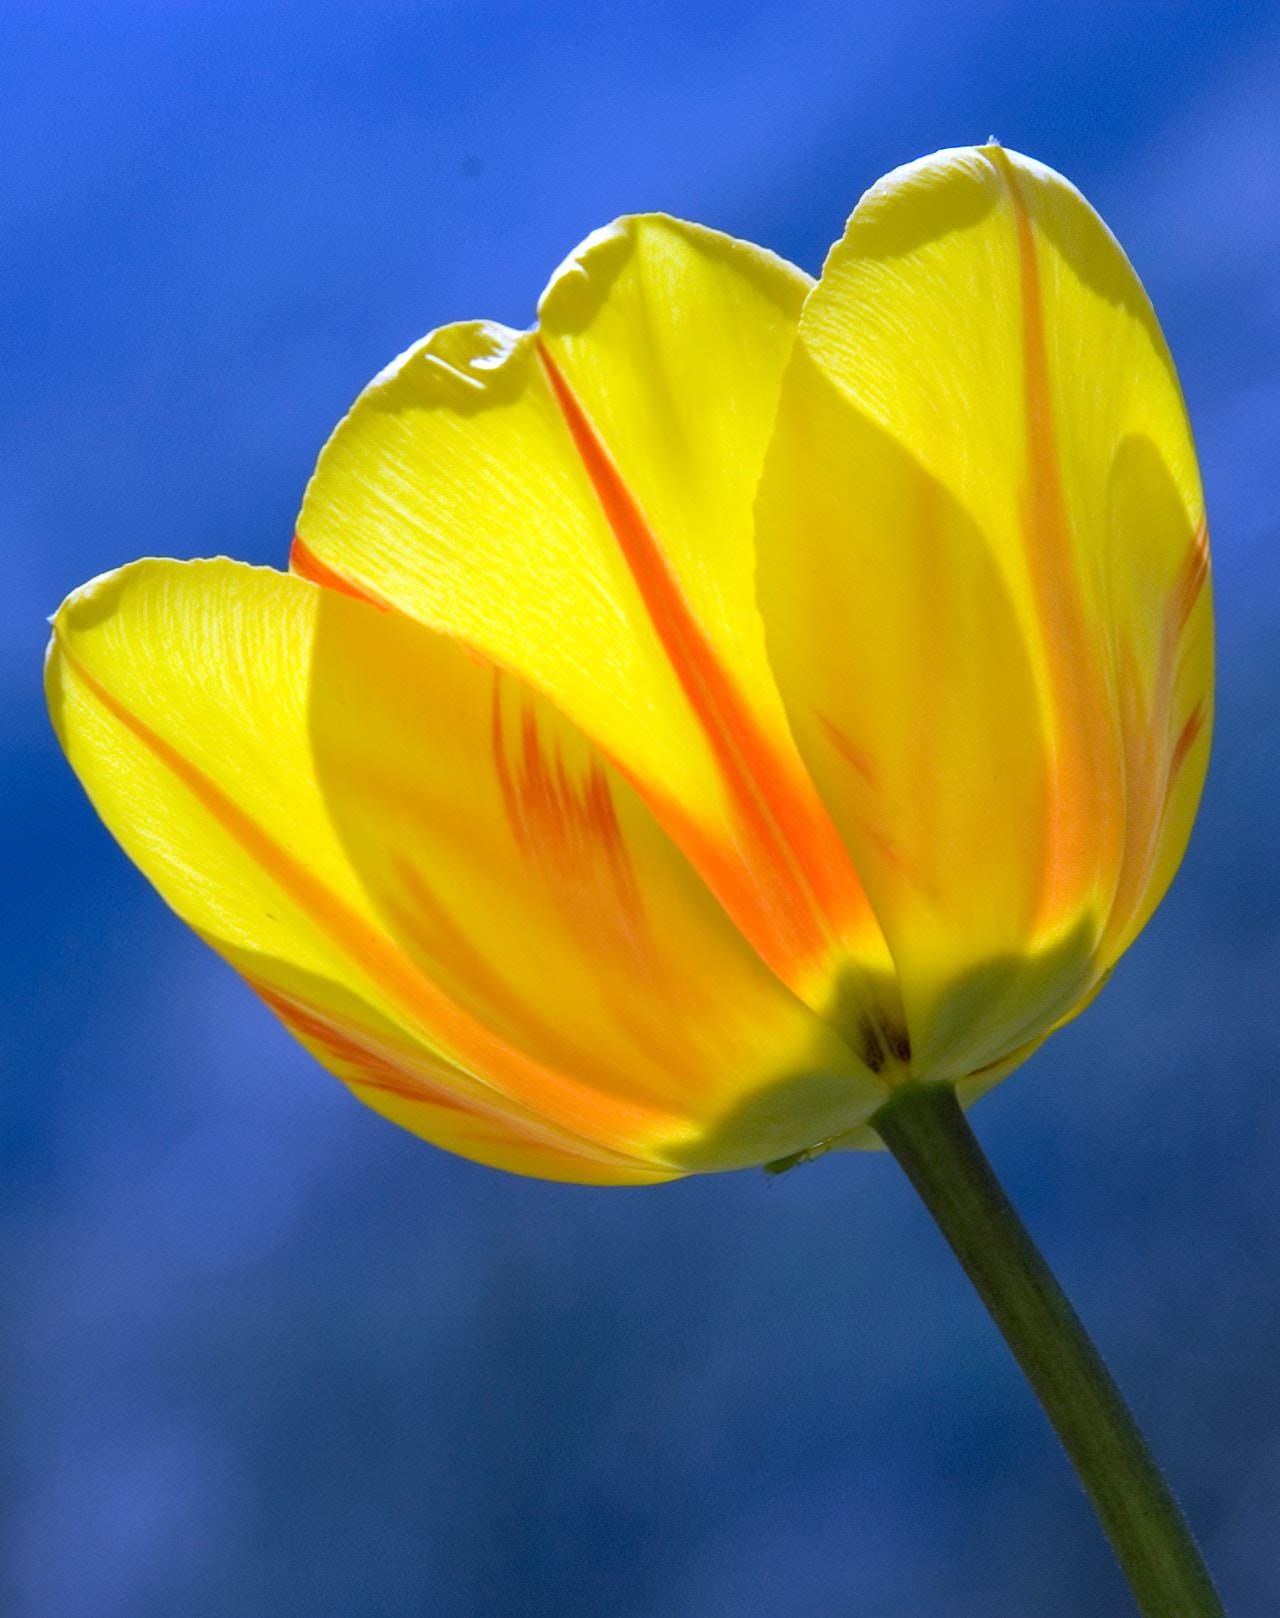 tulip-yellow-spring-flowers-60115 copy.jpeg